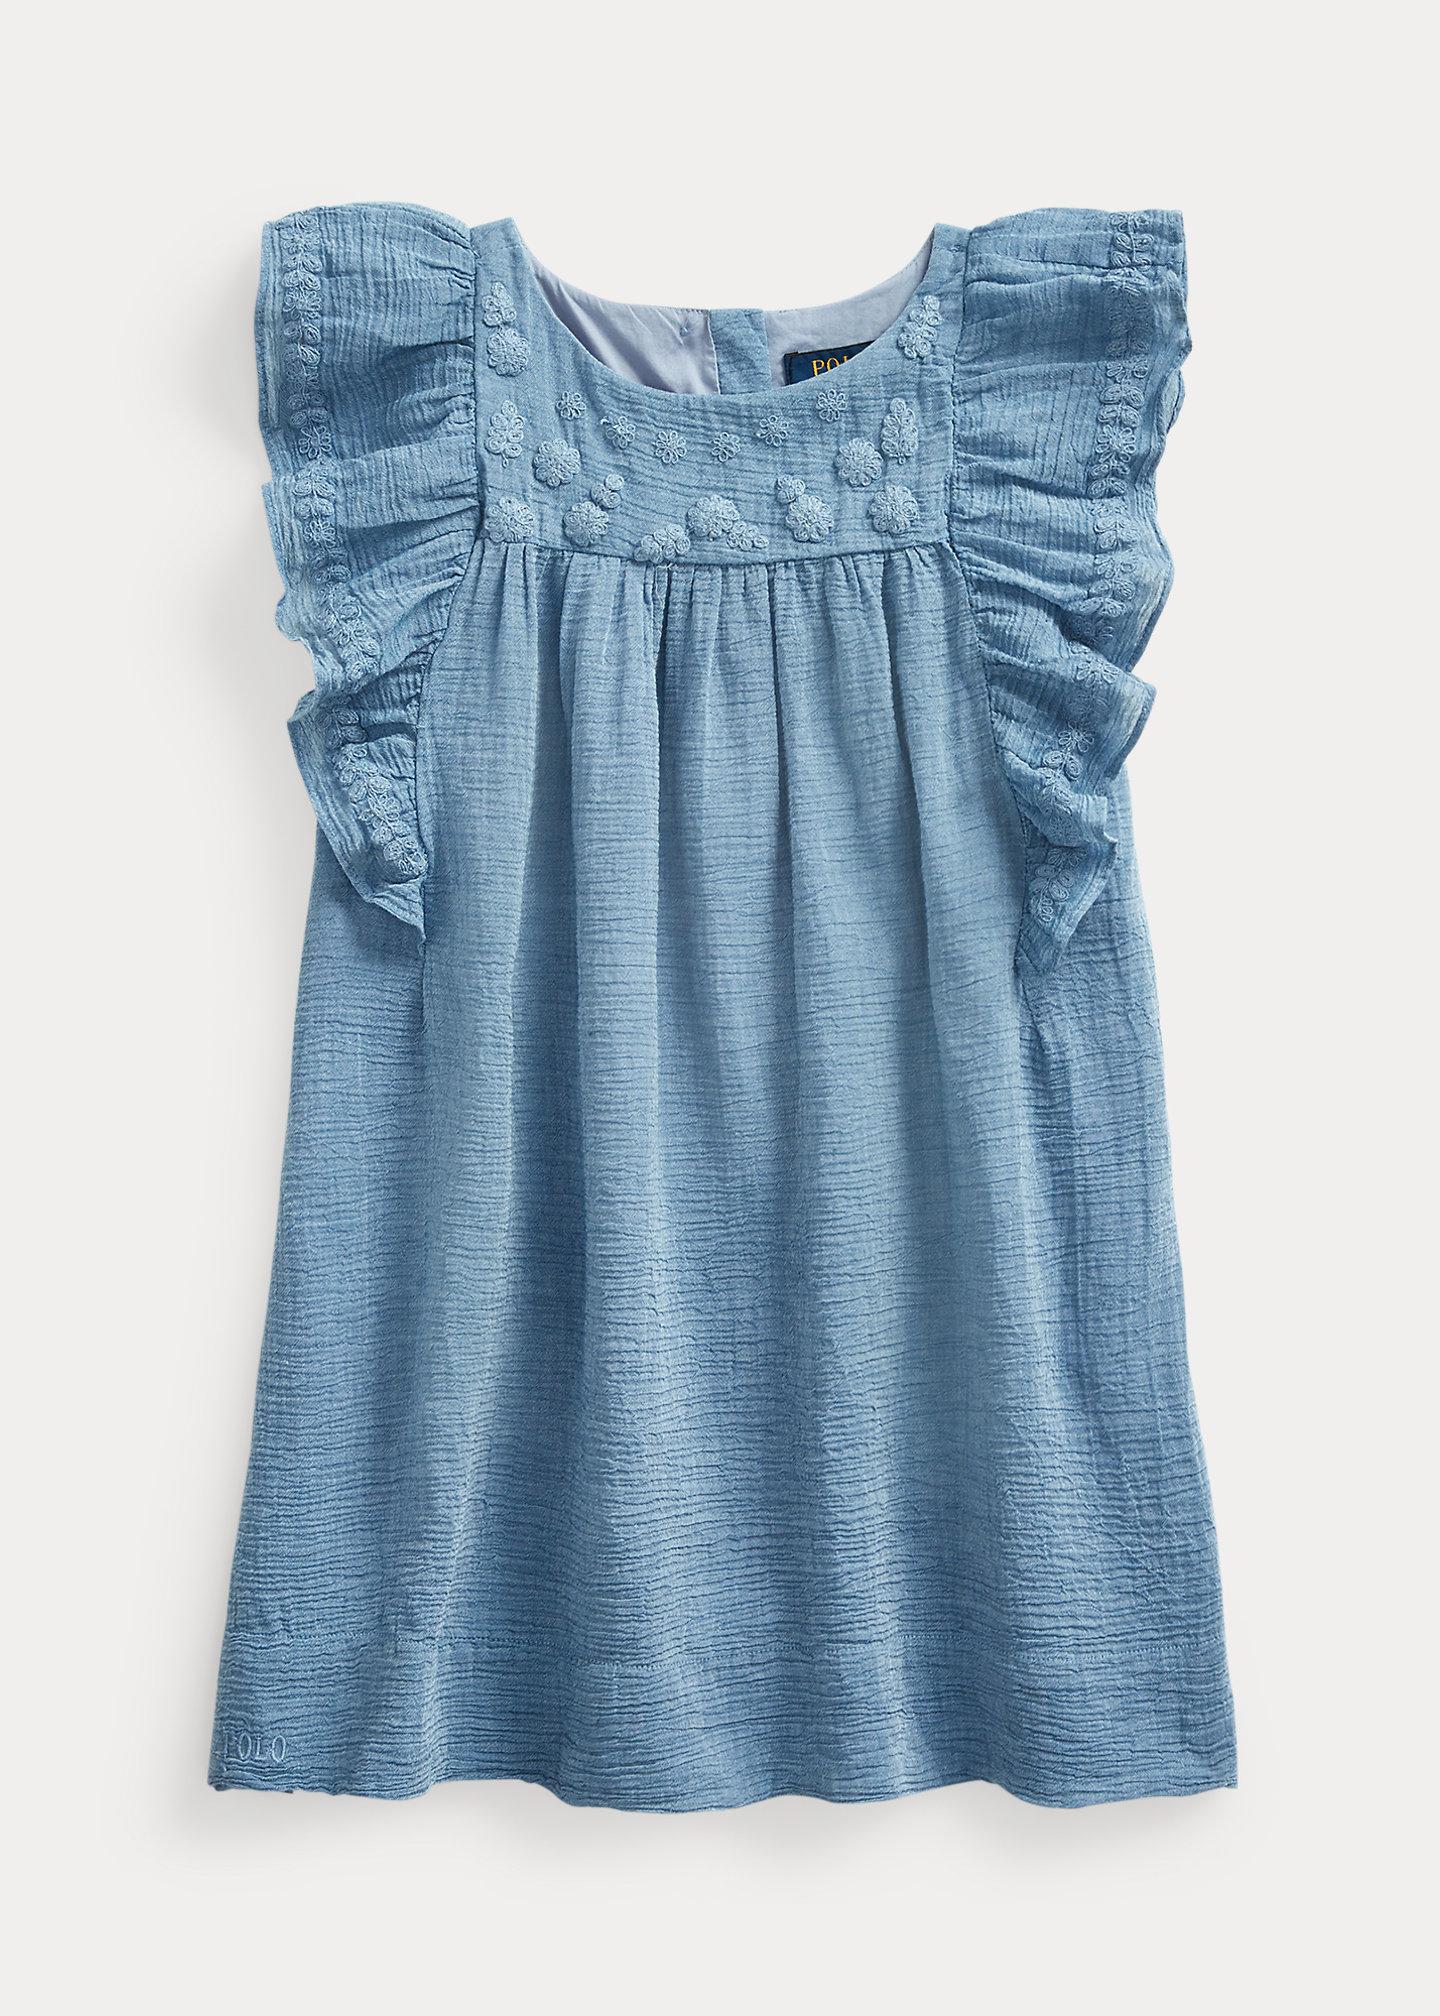 Polo Ralph Lauren Embroidered Cotton Blend Dress